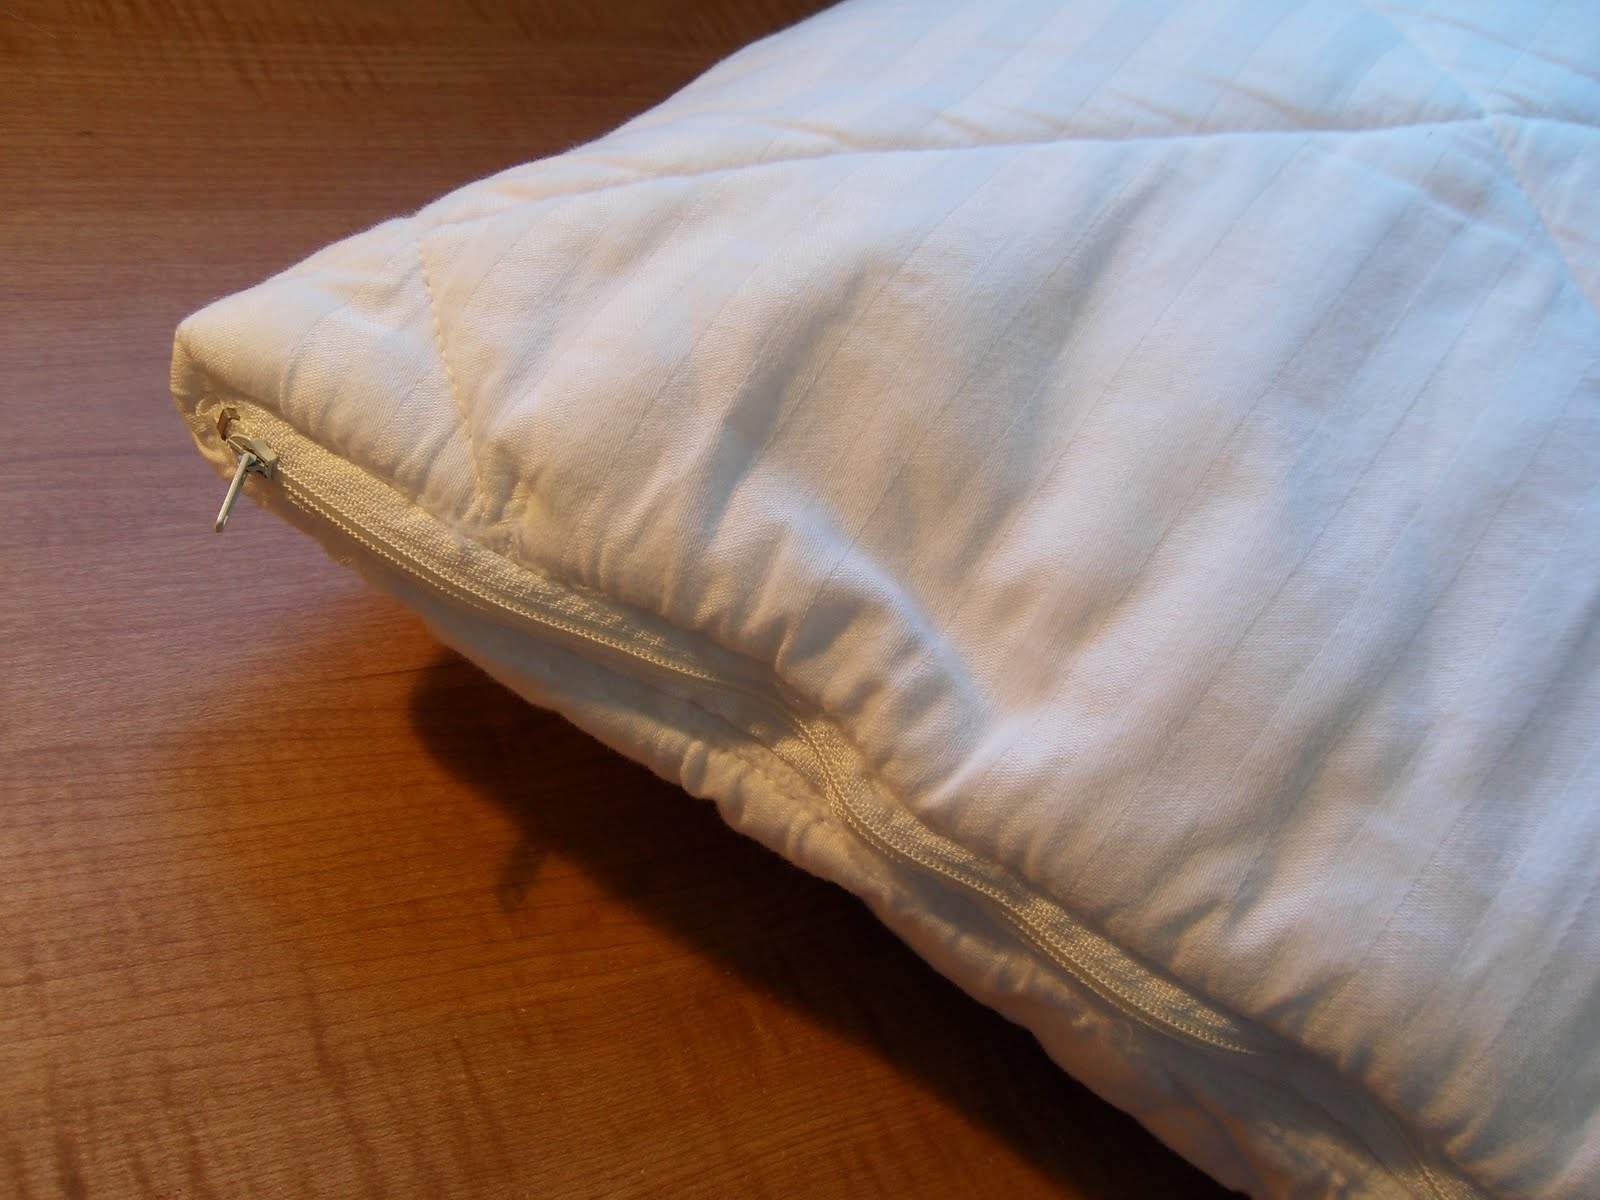 Dust mites on pillows - photo#4